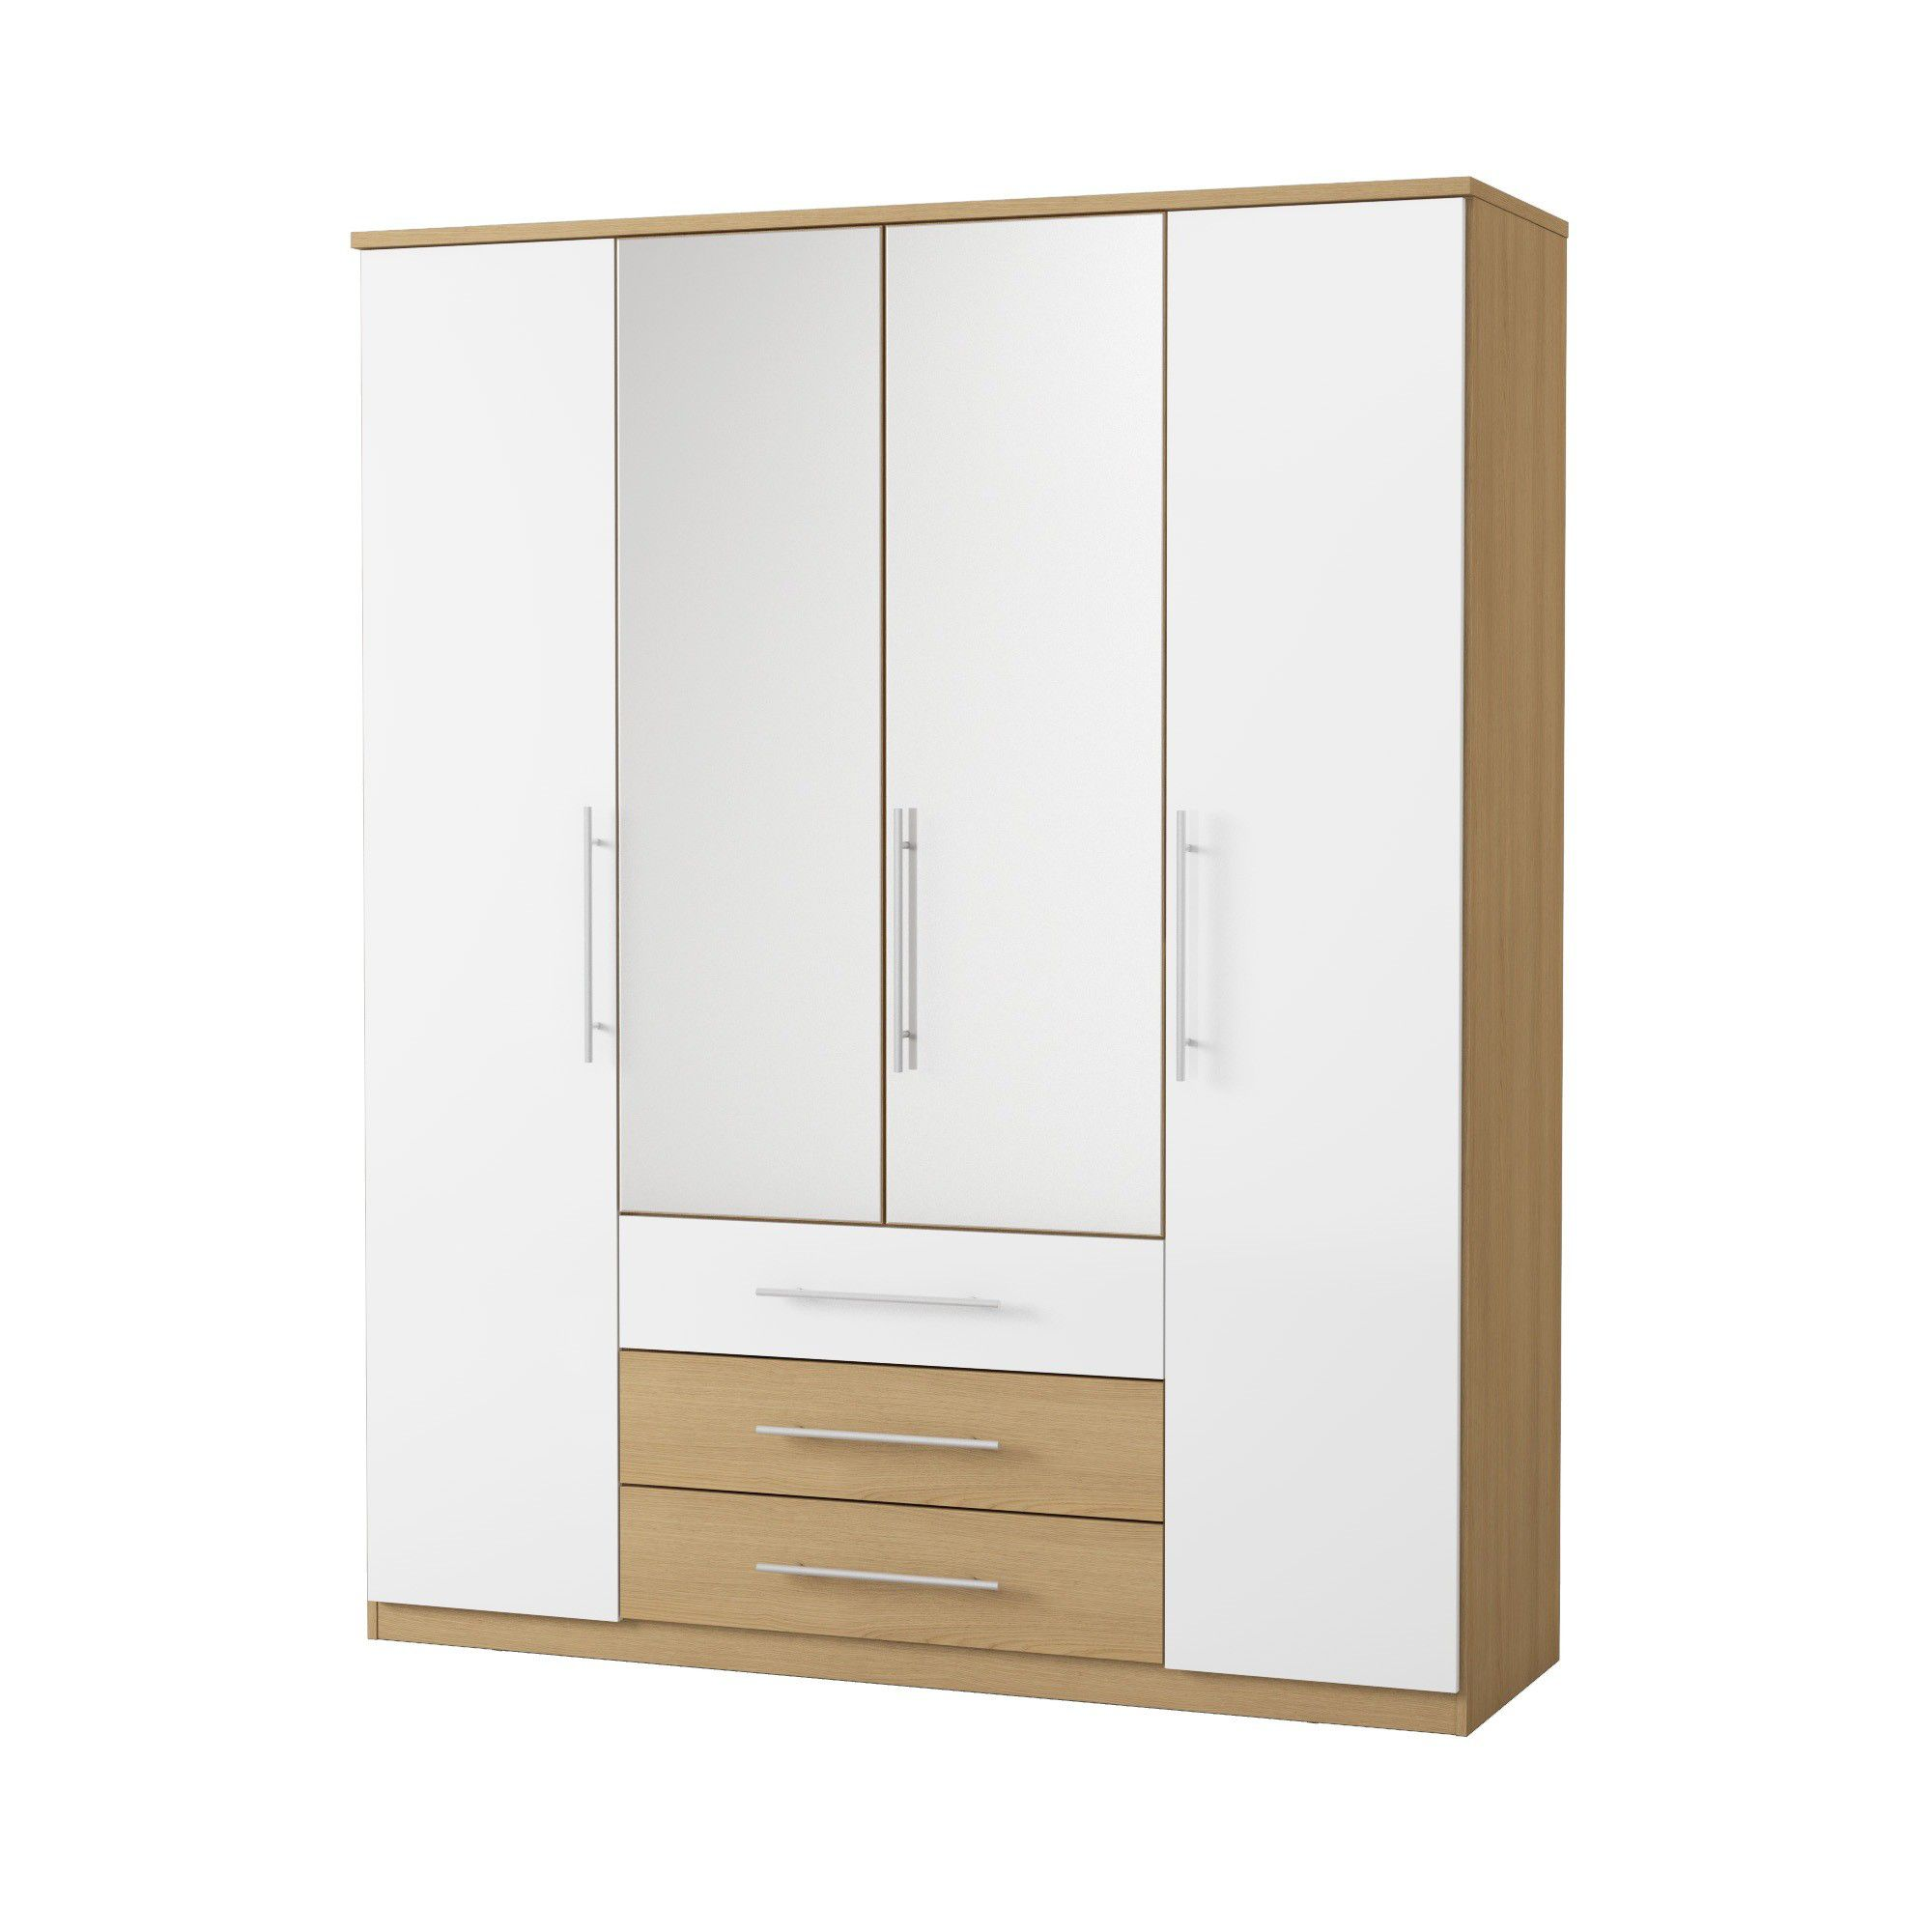 Urbane Designs Sorrento 4 Door 3 Drawer CNT Mirror Wardrobe at Tesco Direct